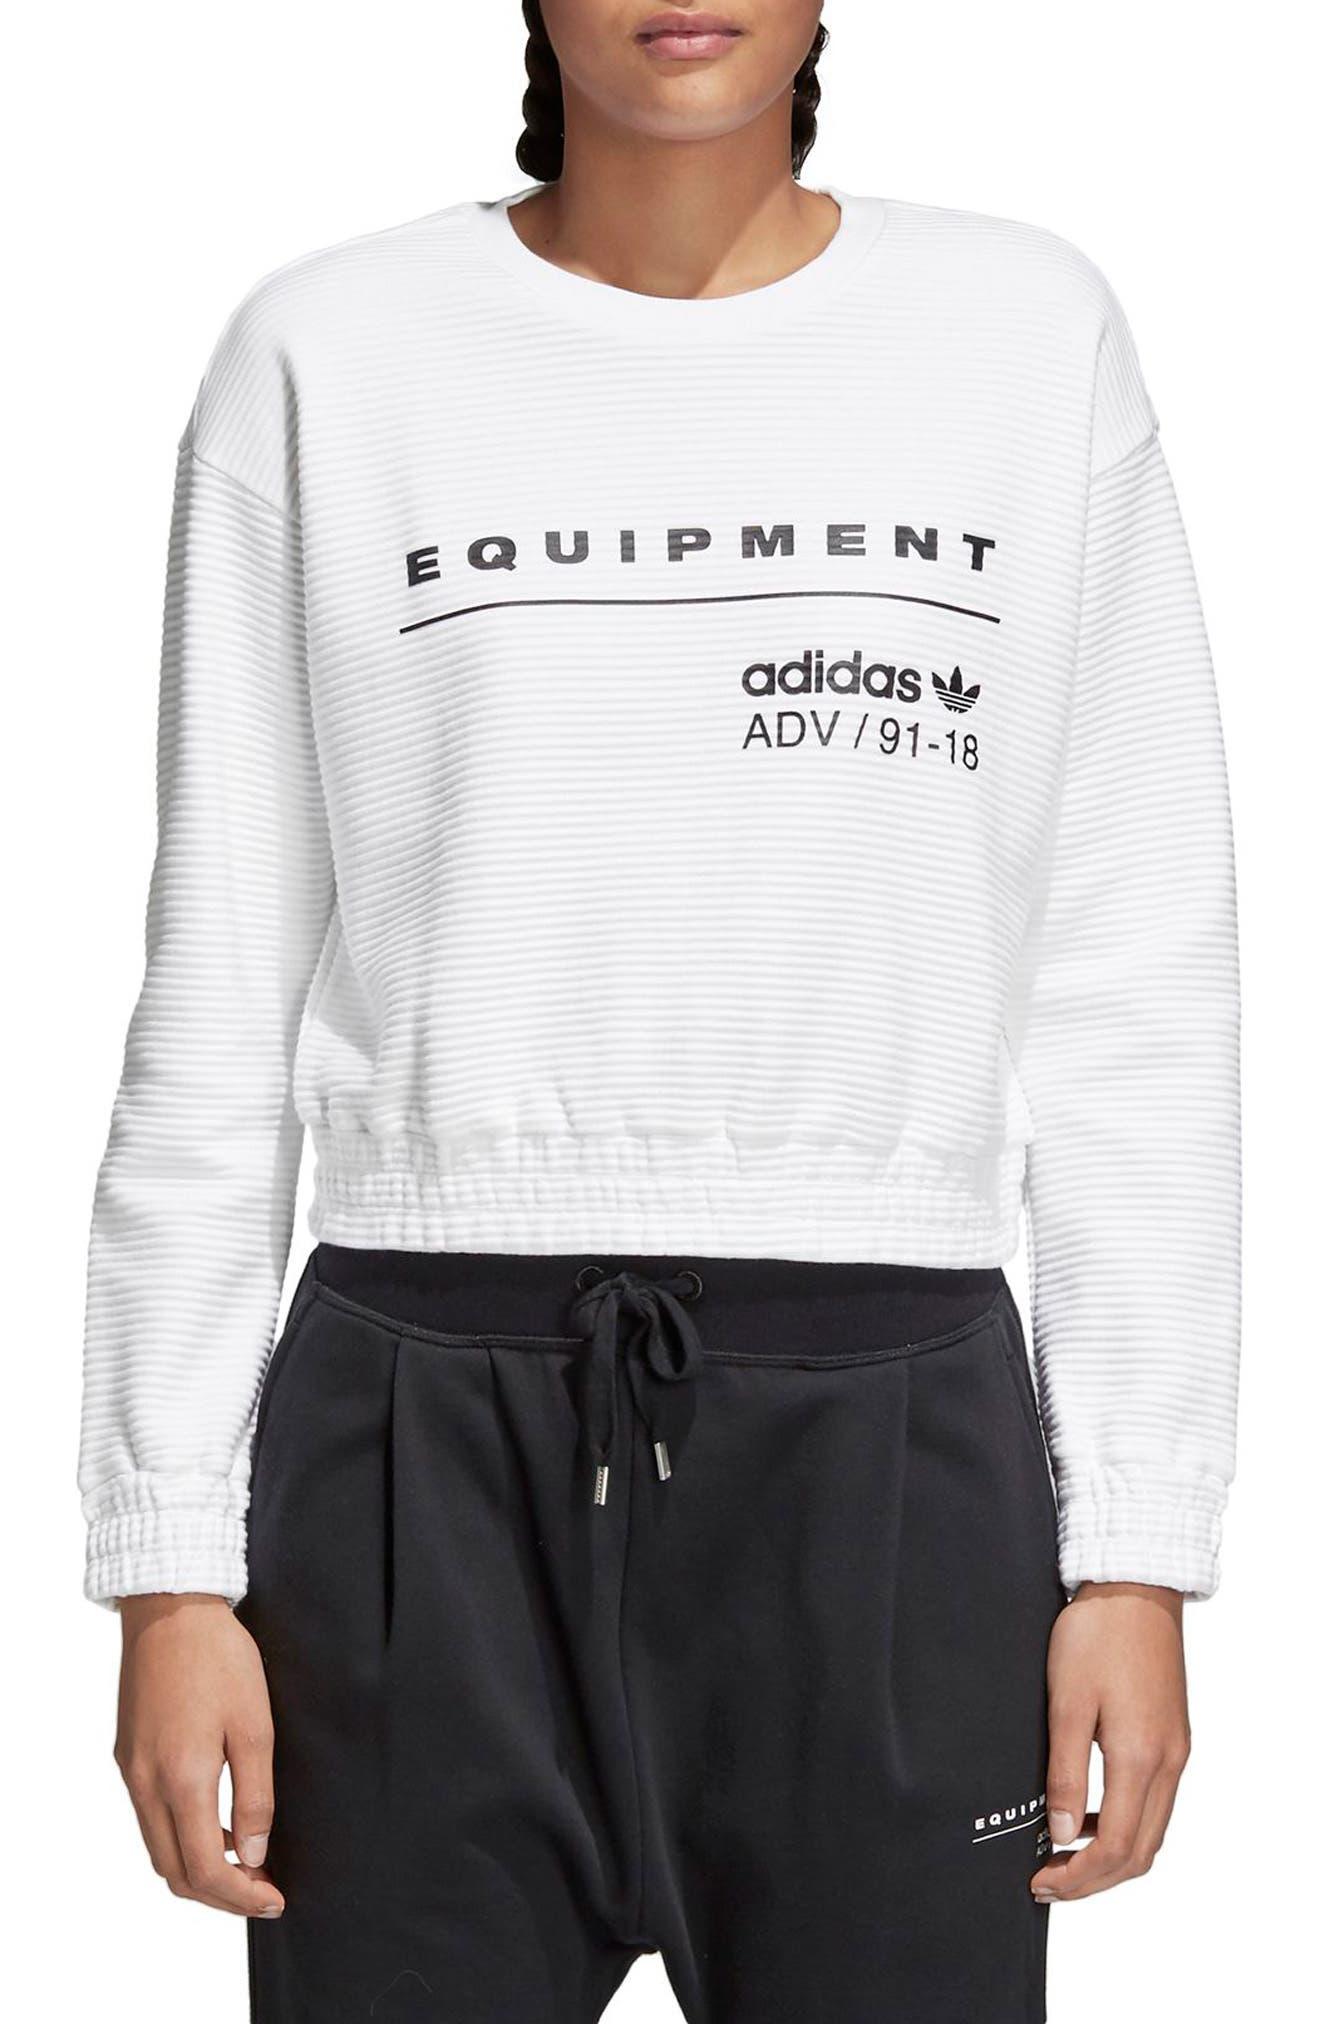 EQT Sweatshirt,                             Main thumbnail 1, color,                             White